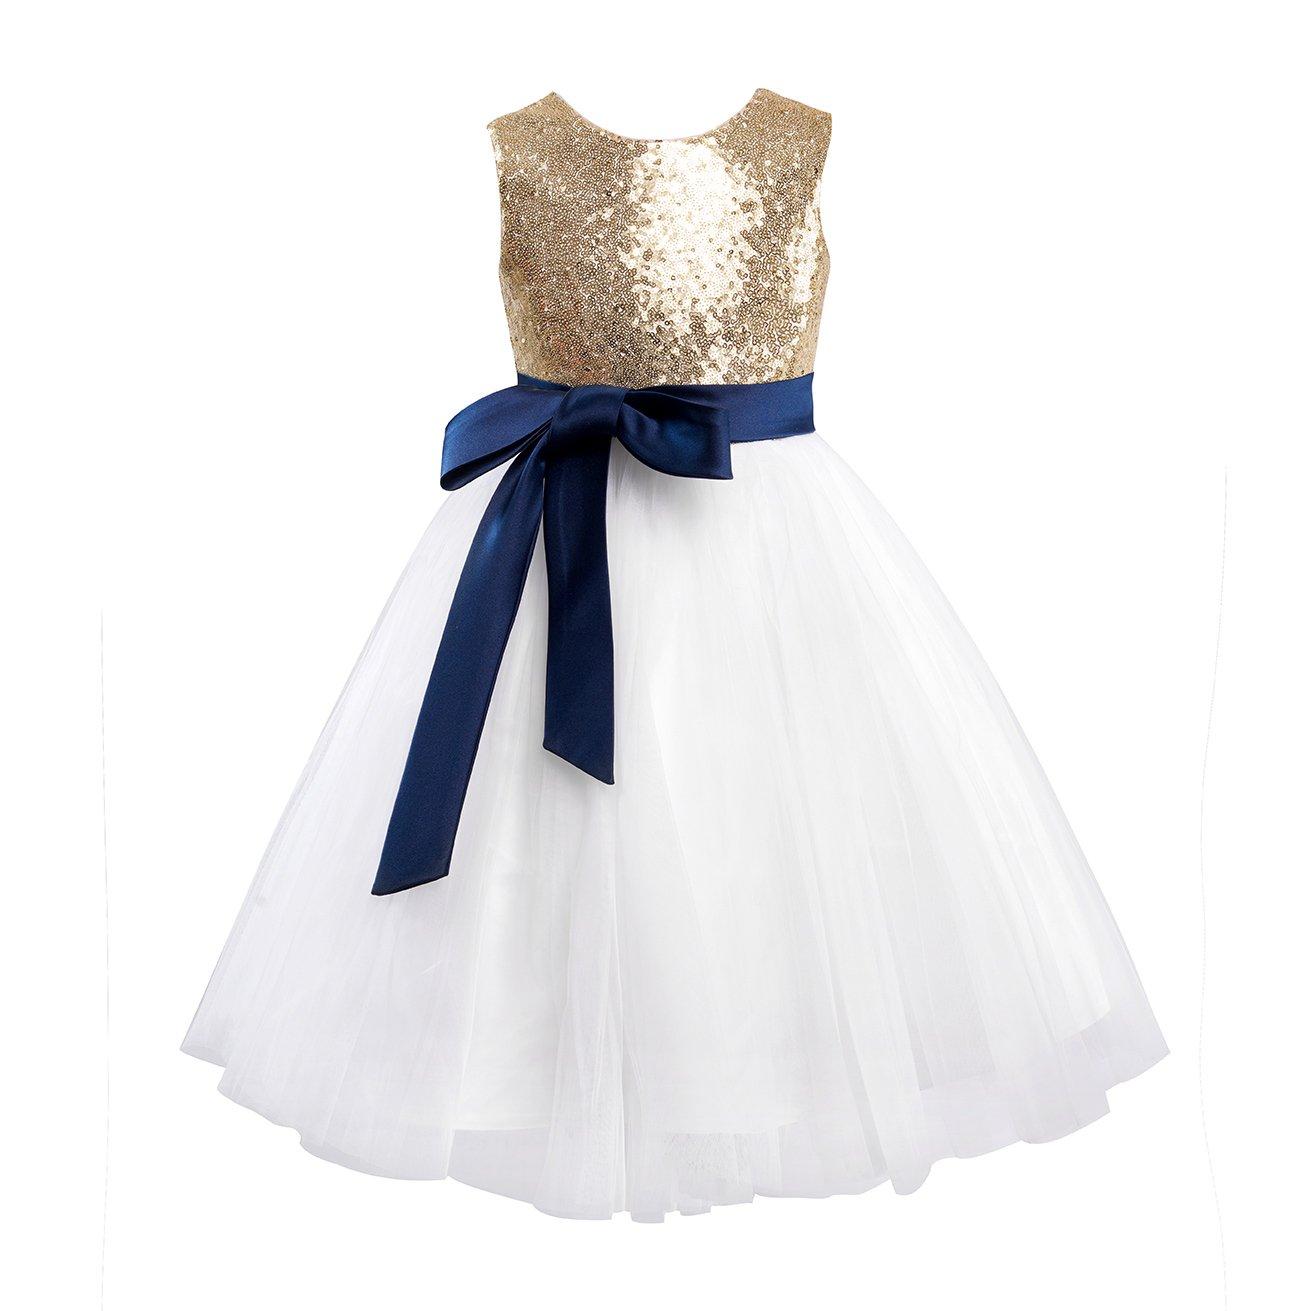 5dadfb92f3b9e Miama Gold Sequin Ivory Tulle Wedding Flower Girl Dress Junior Bridesmaid  Dress